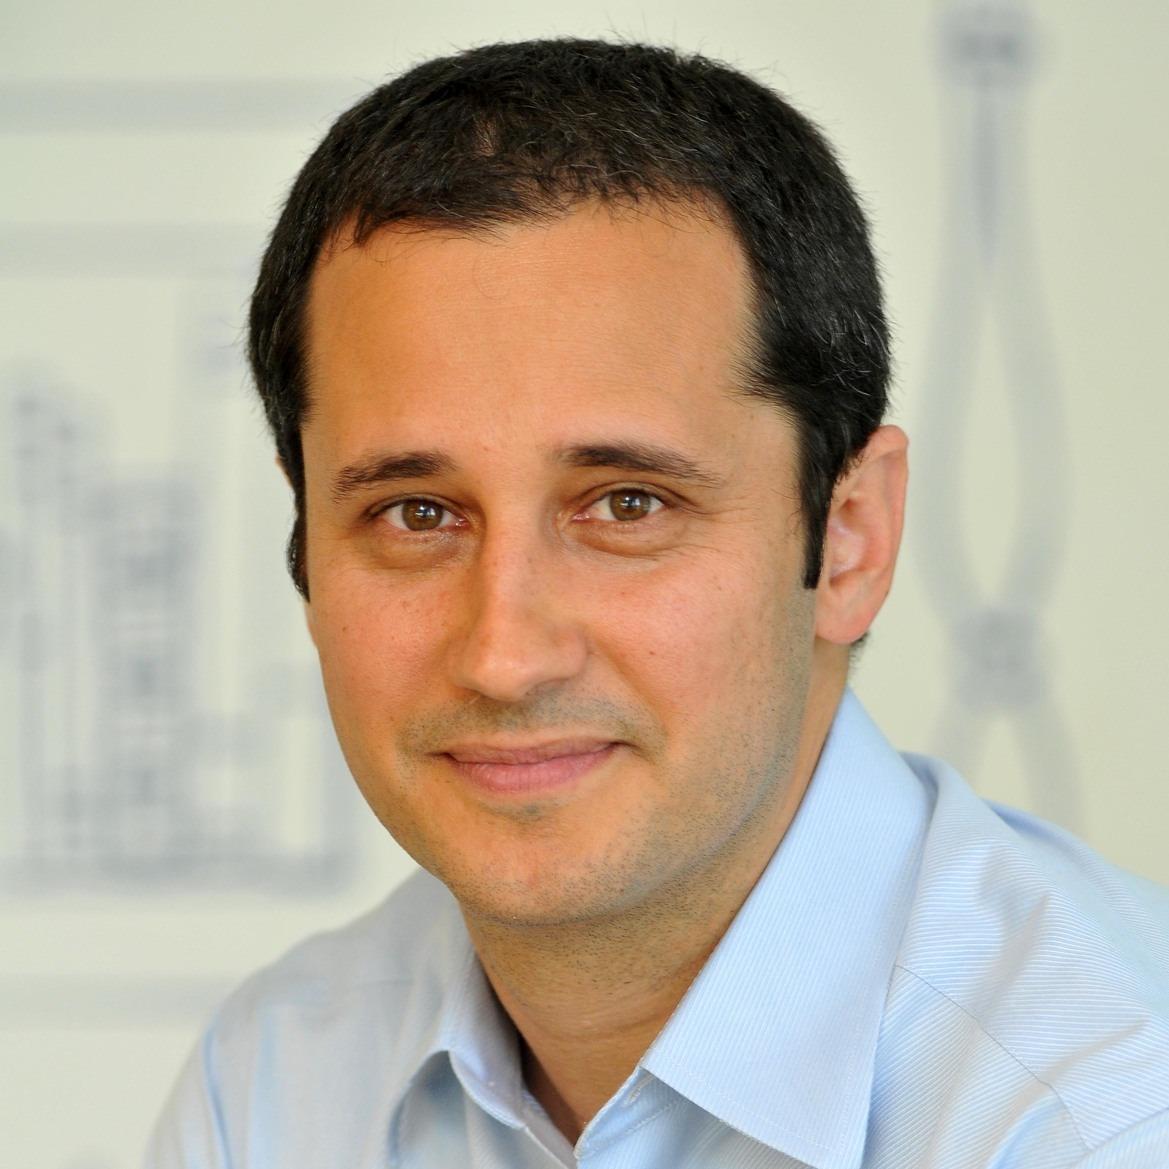 Pedro Arnt